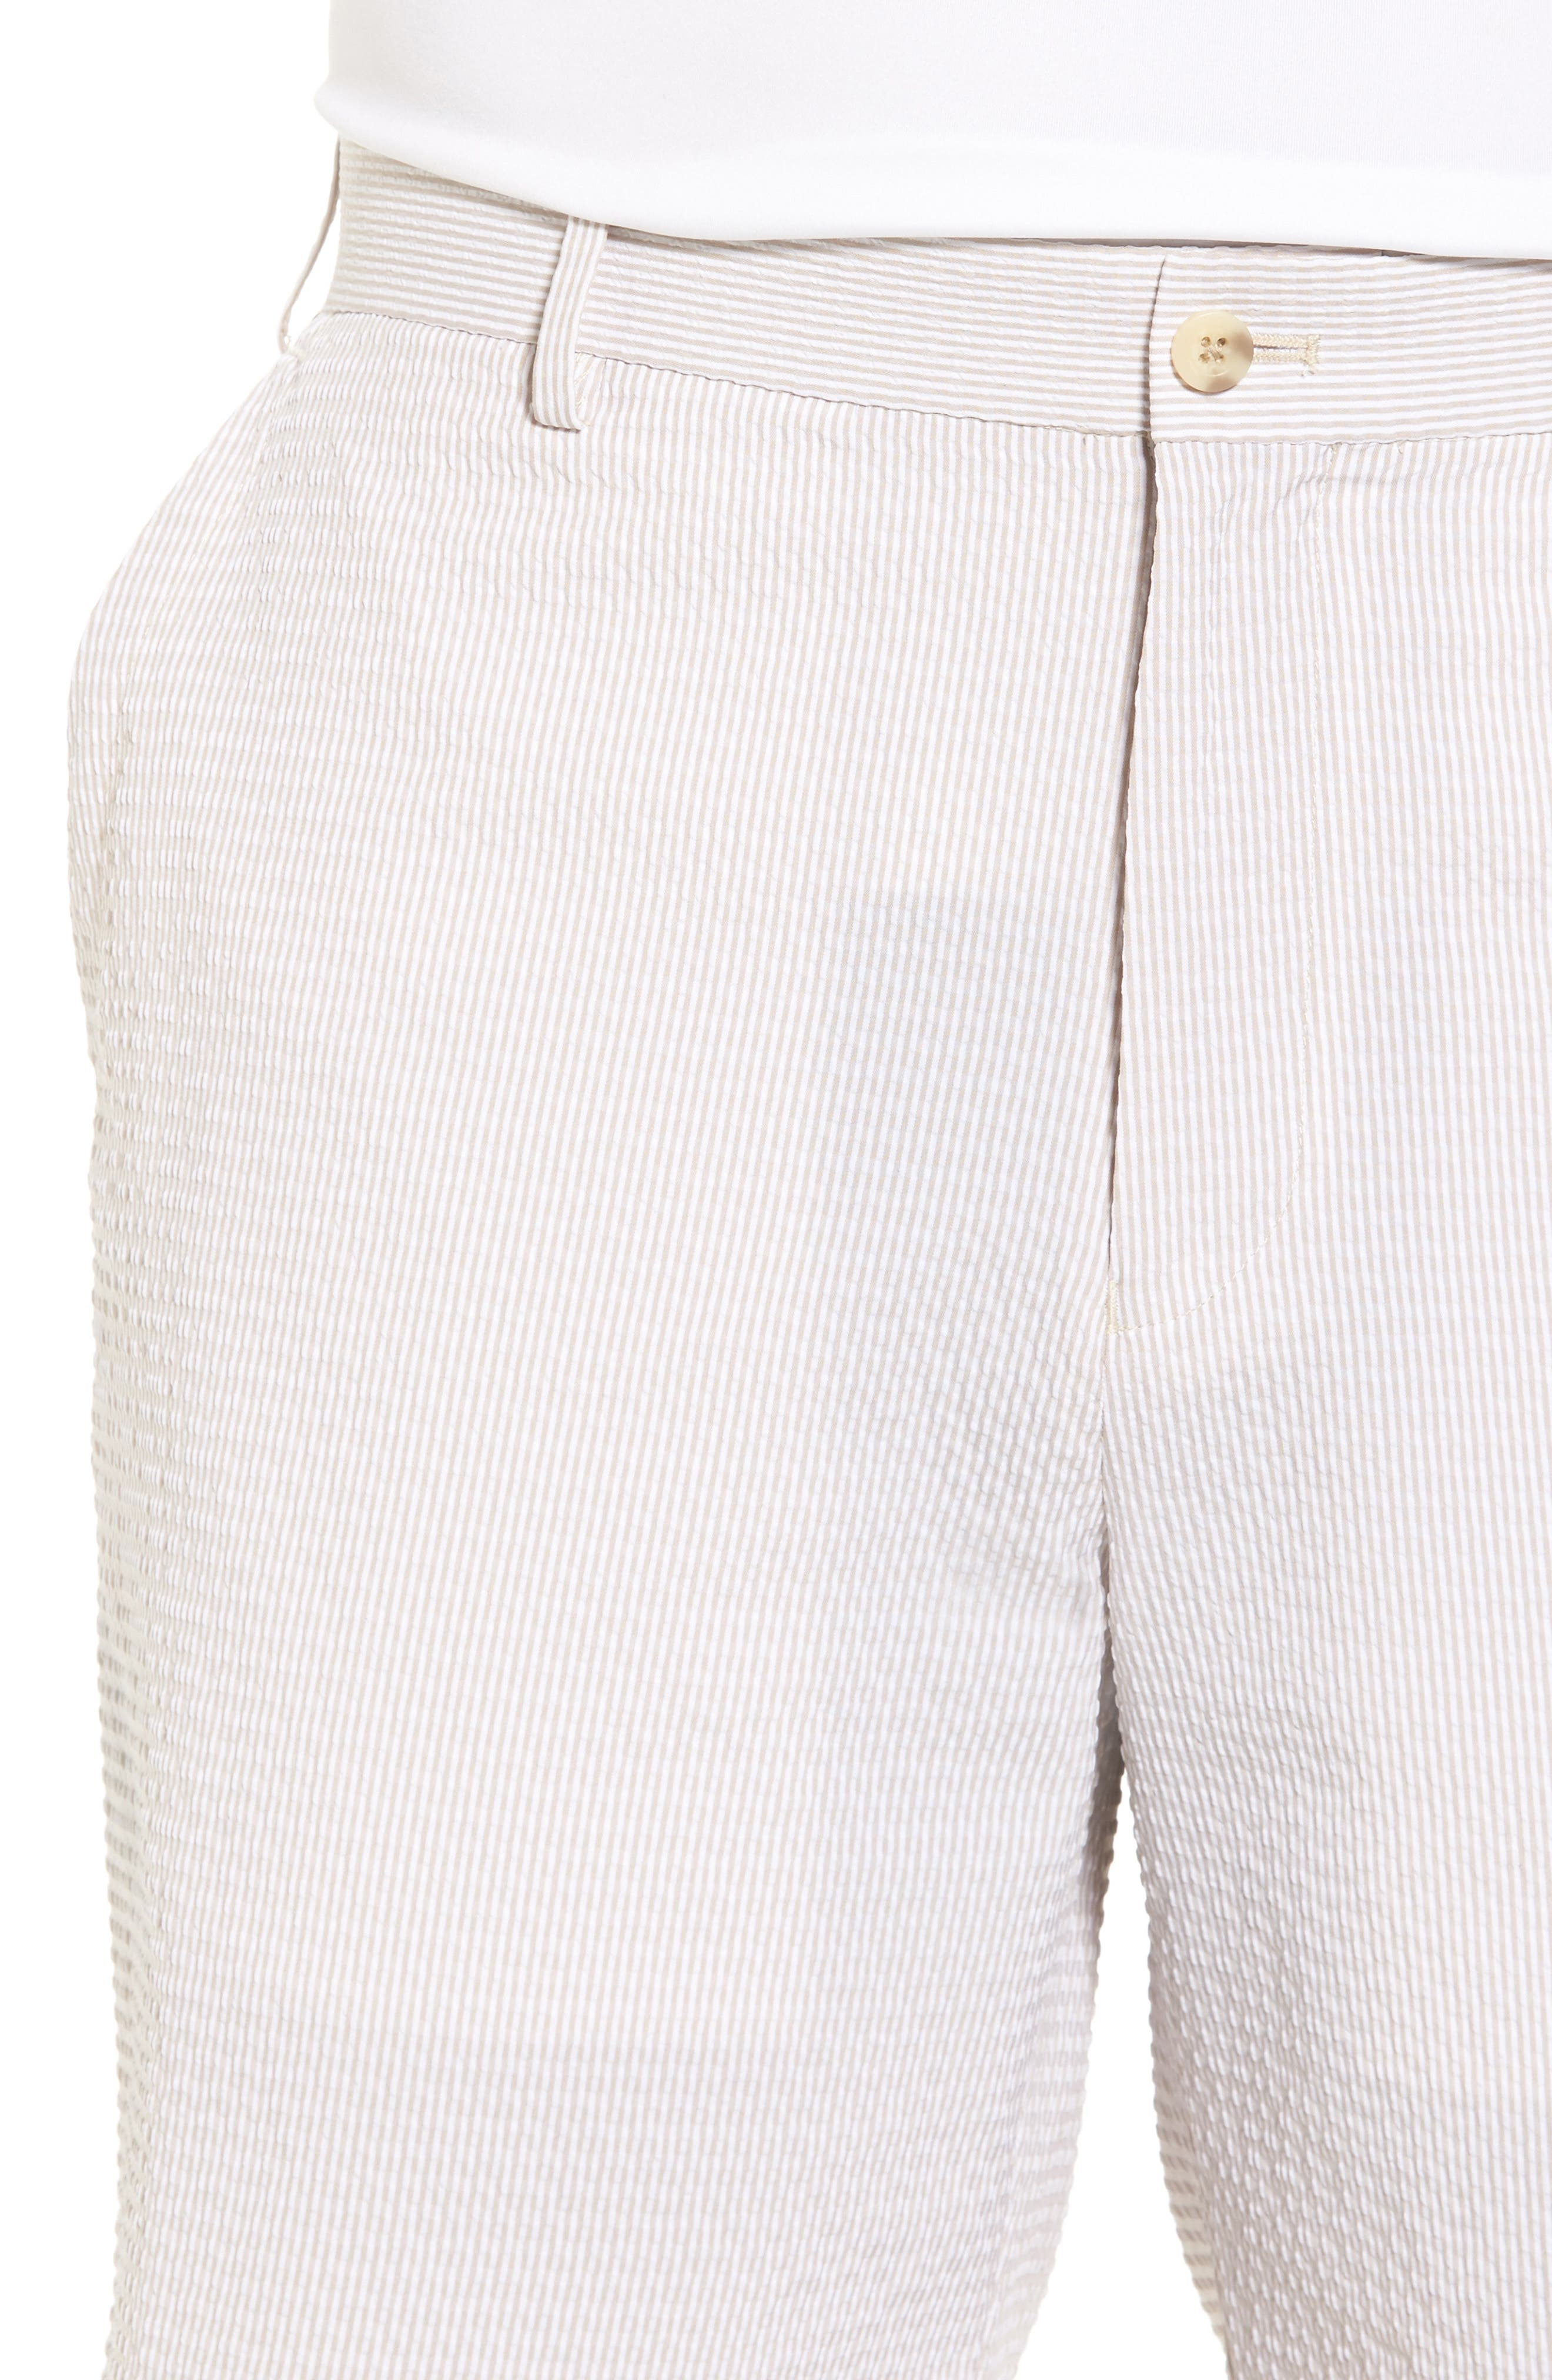 Apex Pinstripe Seersucker Shorts,                             Alternate thumbnail 4, color,                             260